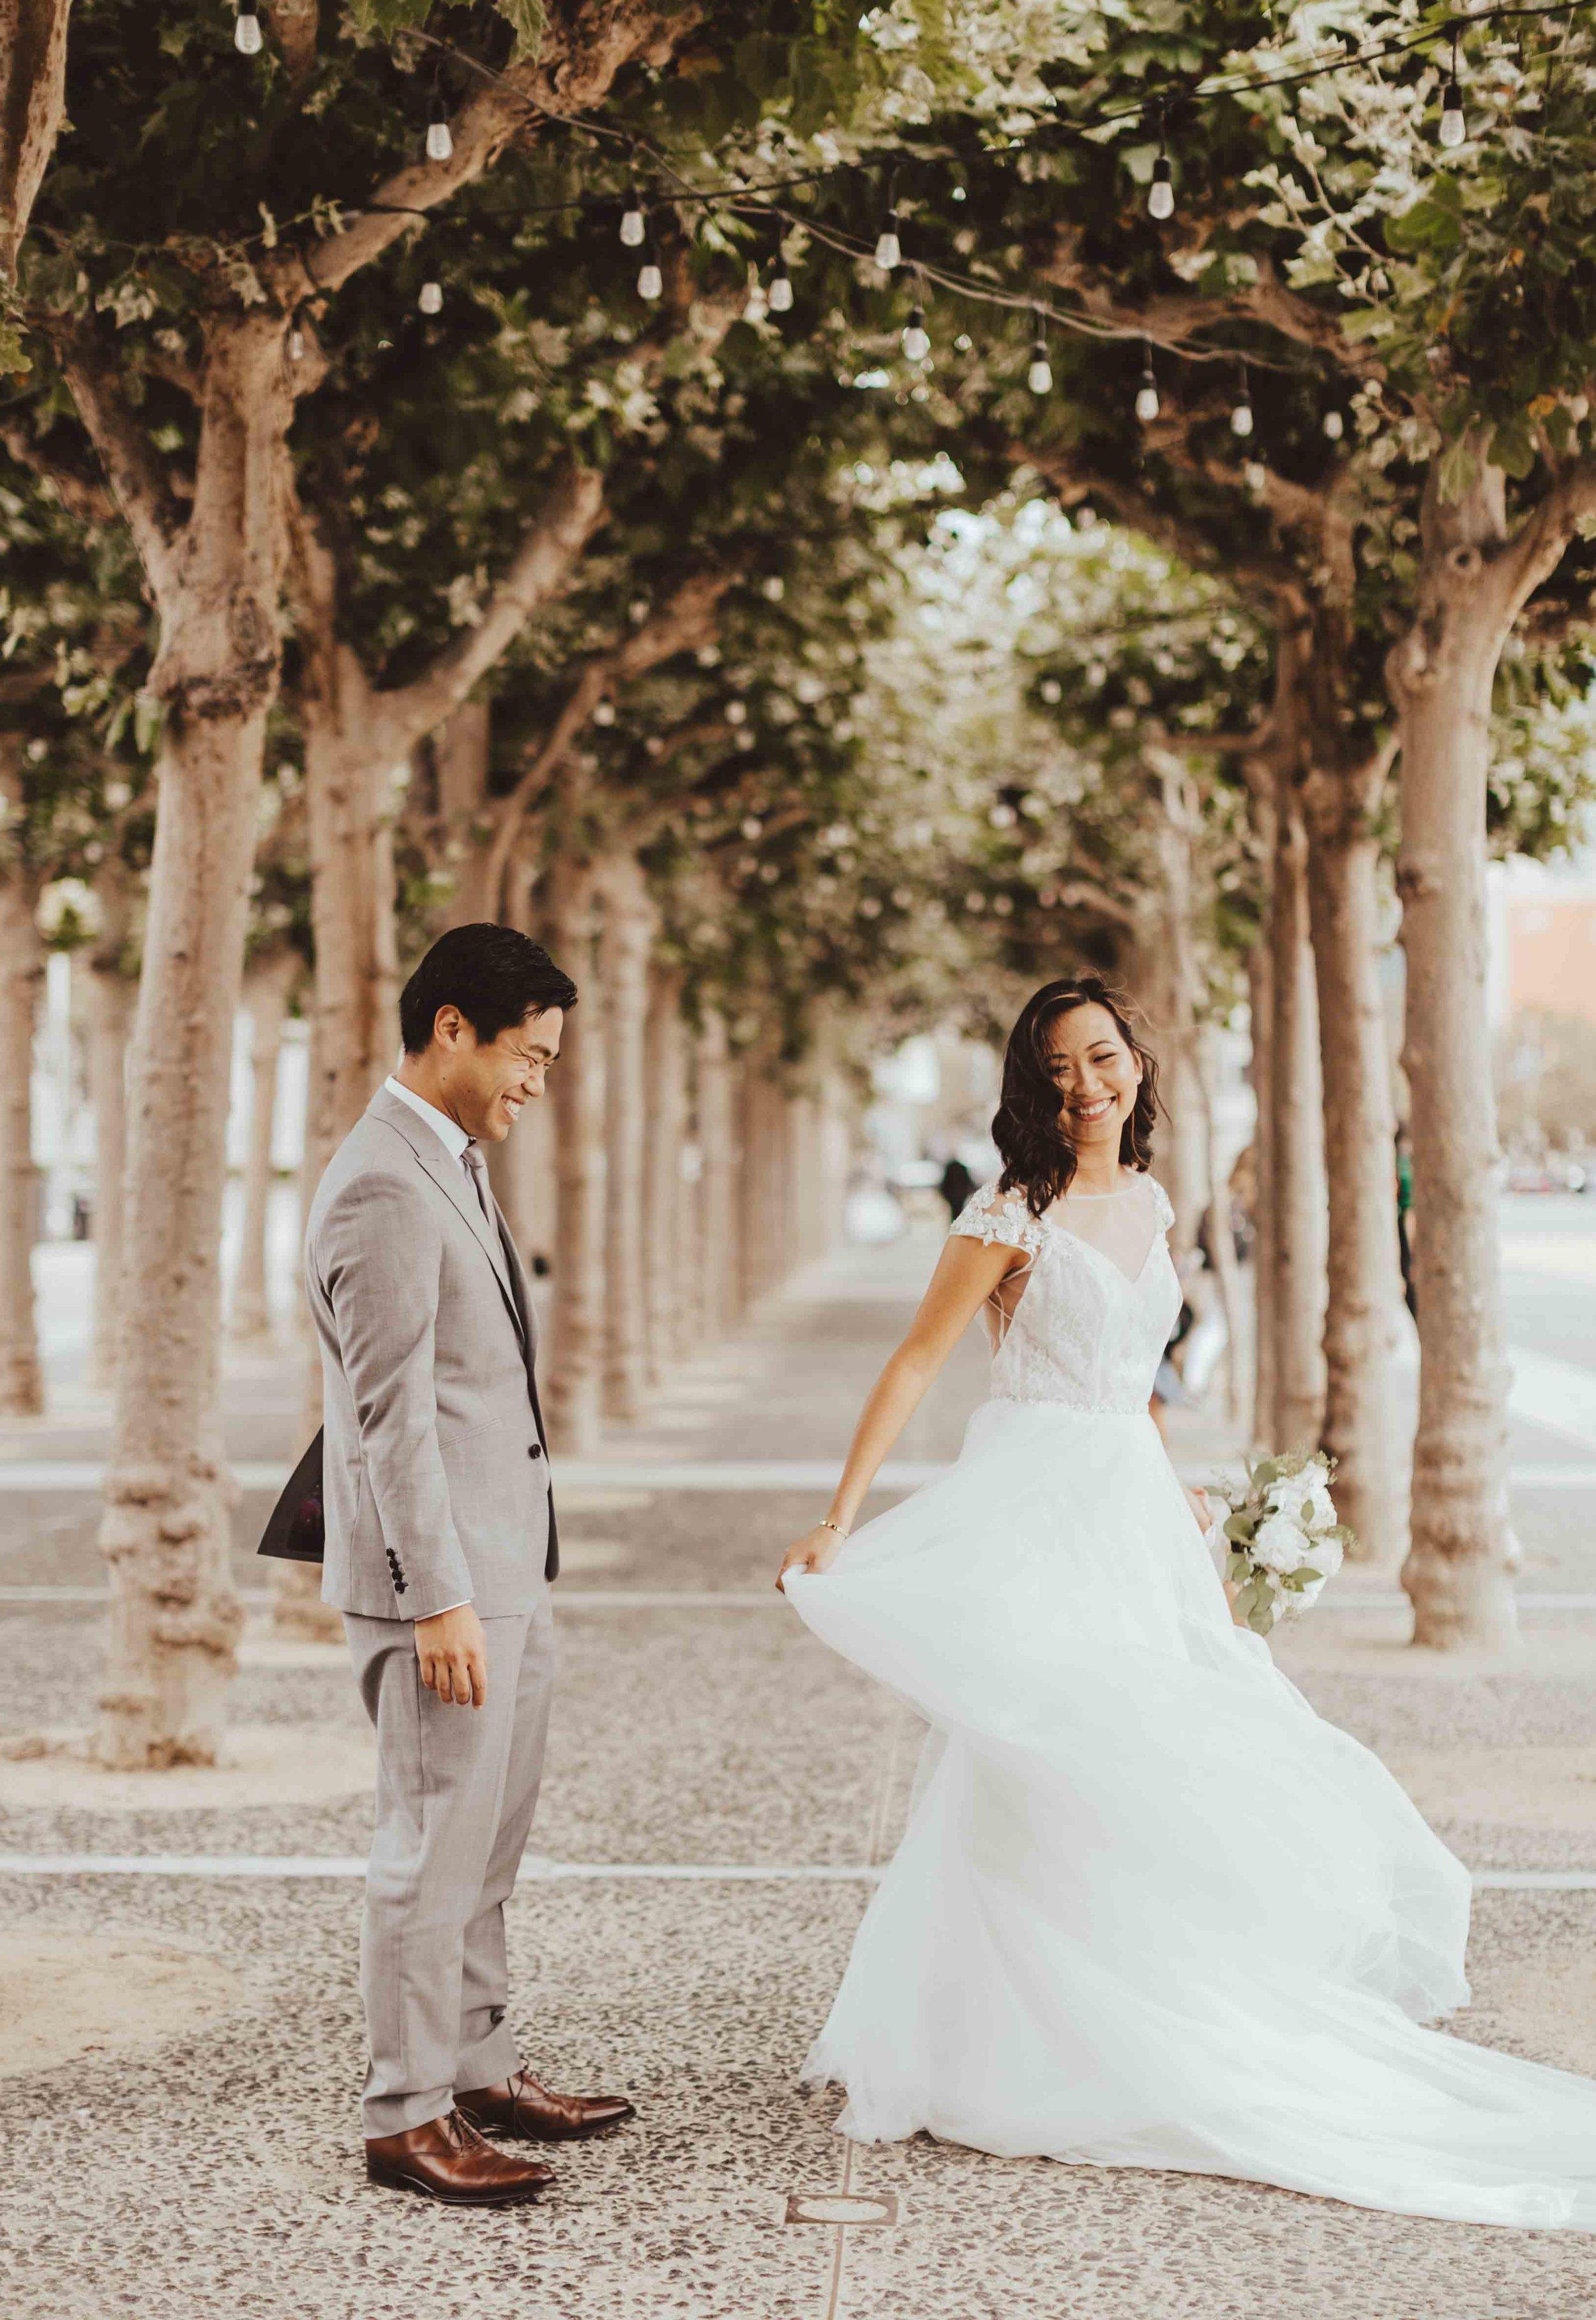 weddingday (6 of 67).jpg